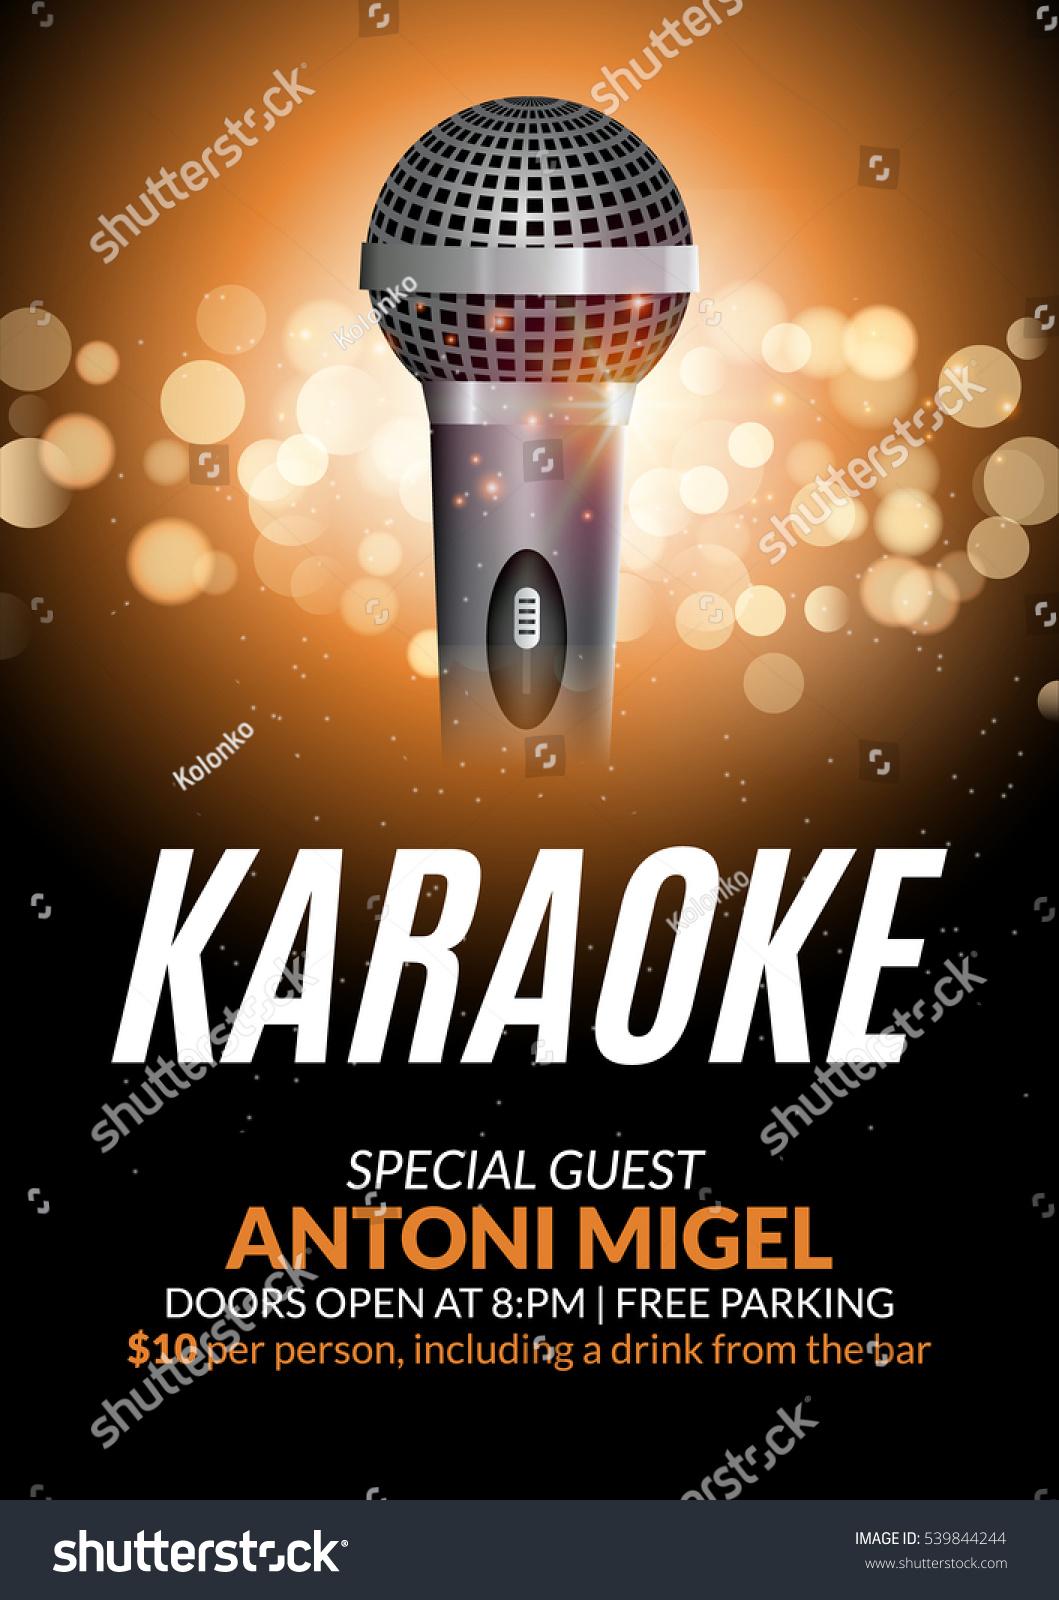 Karaoke Party Invitation Poster Design Template Stock ...   1059 x 1600 jpeg 422kB